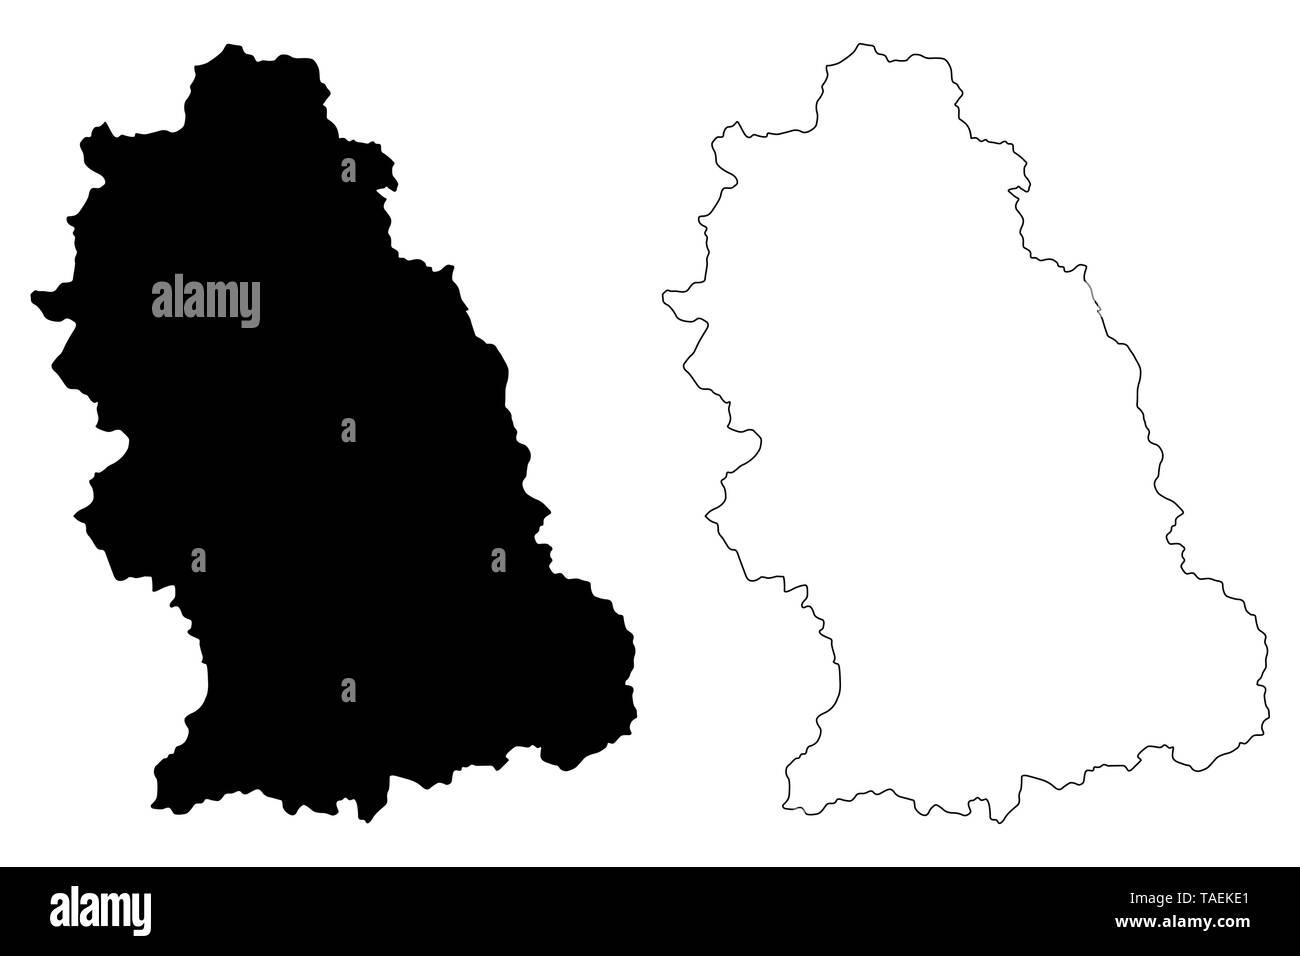 Hunedoara County (Administrative divisions of Romania, Vest development region) map vector illustration, scribble sketch Hunedoara map - Stock Image